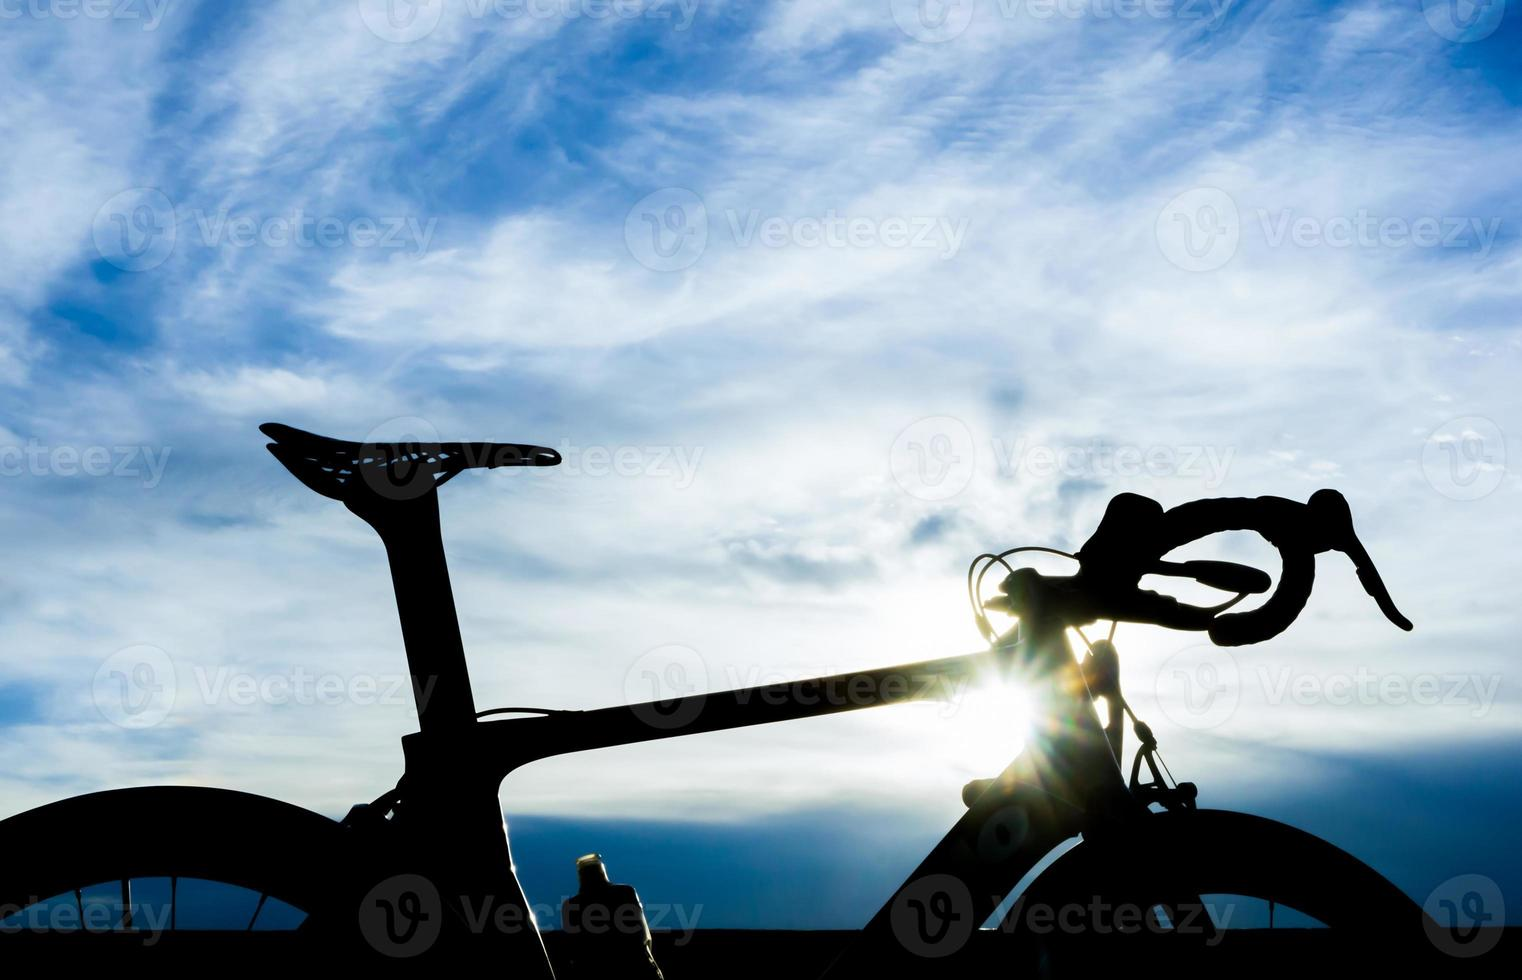 fiets met blauwe hemel en zonnevlam foto